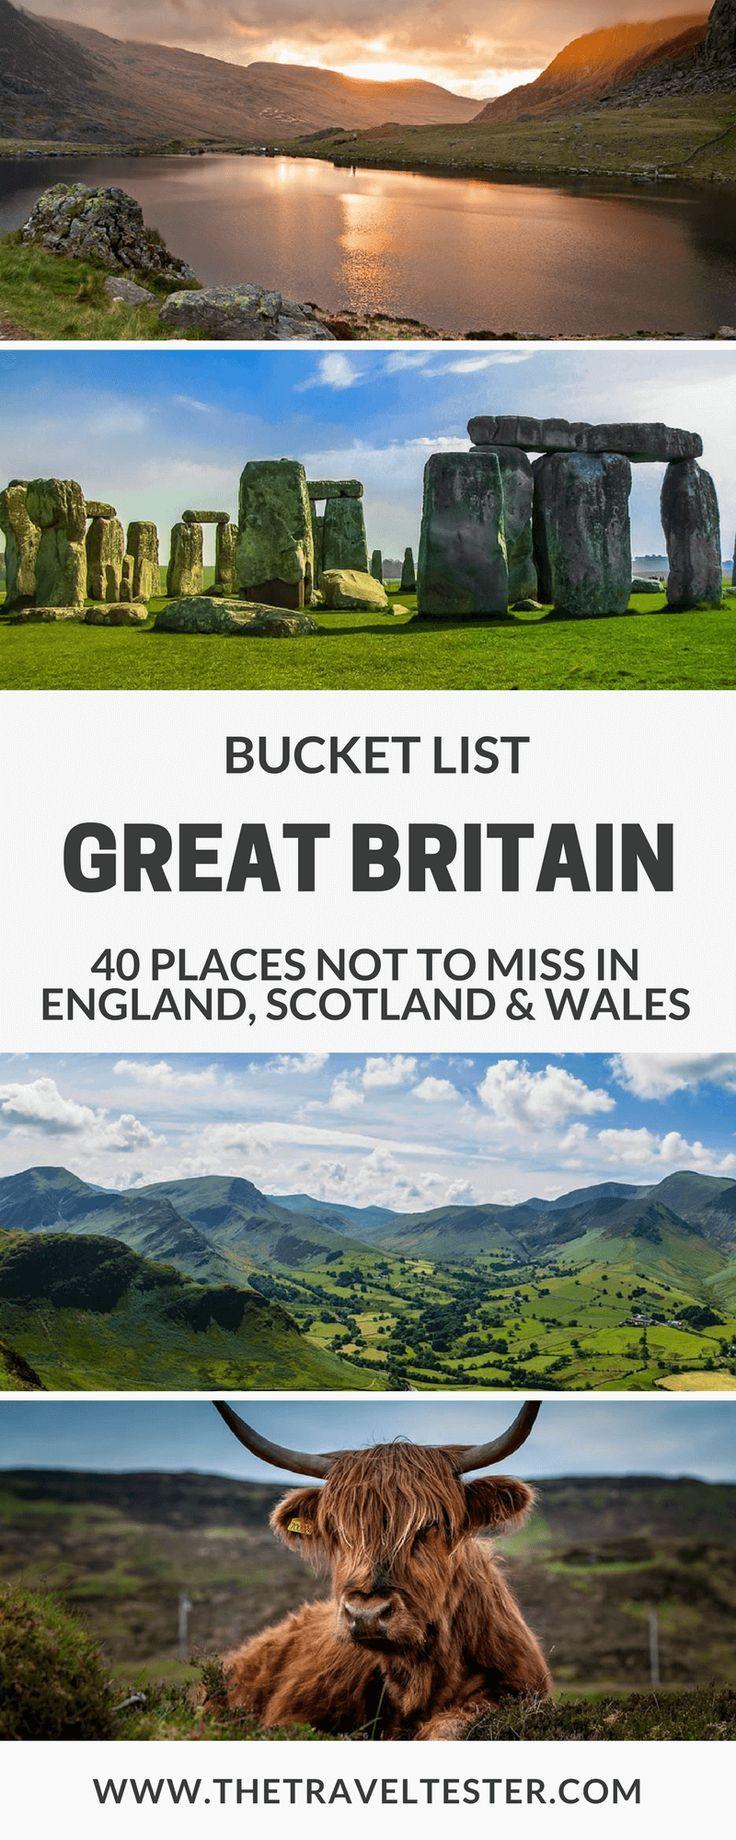 The capital of Scotland - current tourist destination 90